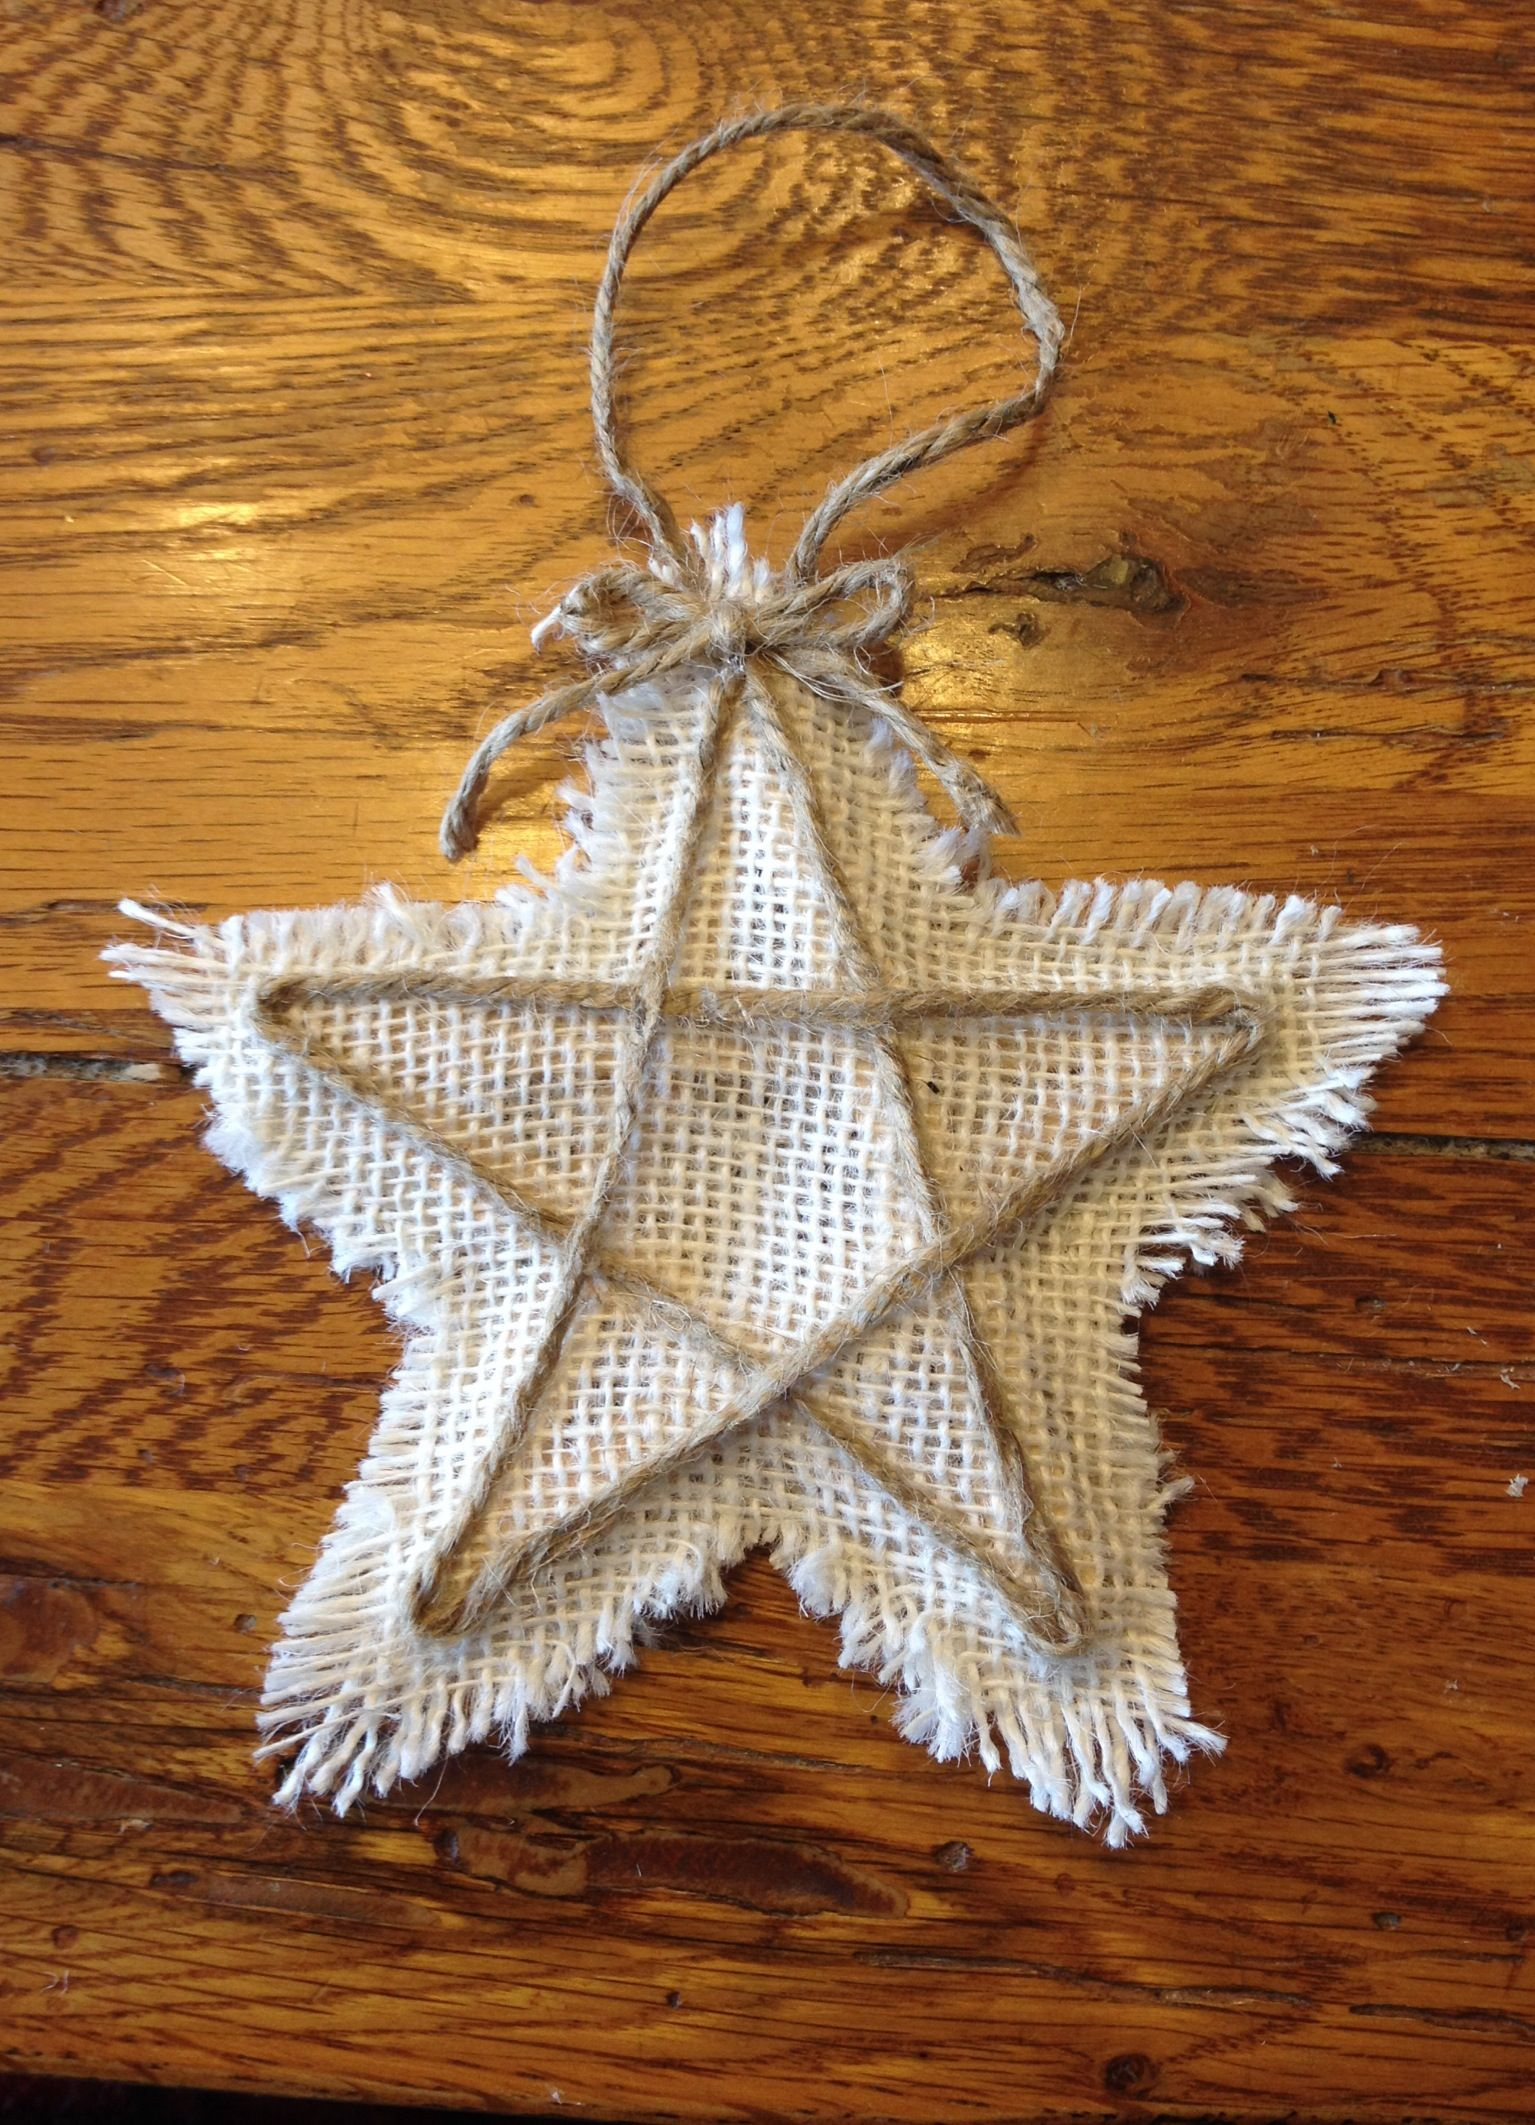 Burlap Star Made with craft sticks, burlap, and jute twine ...